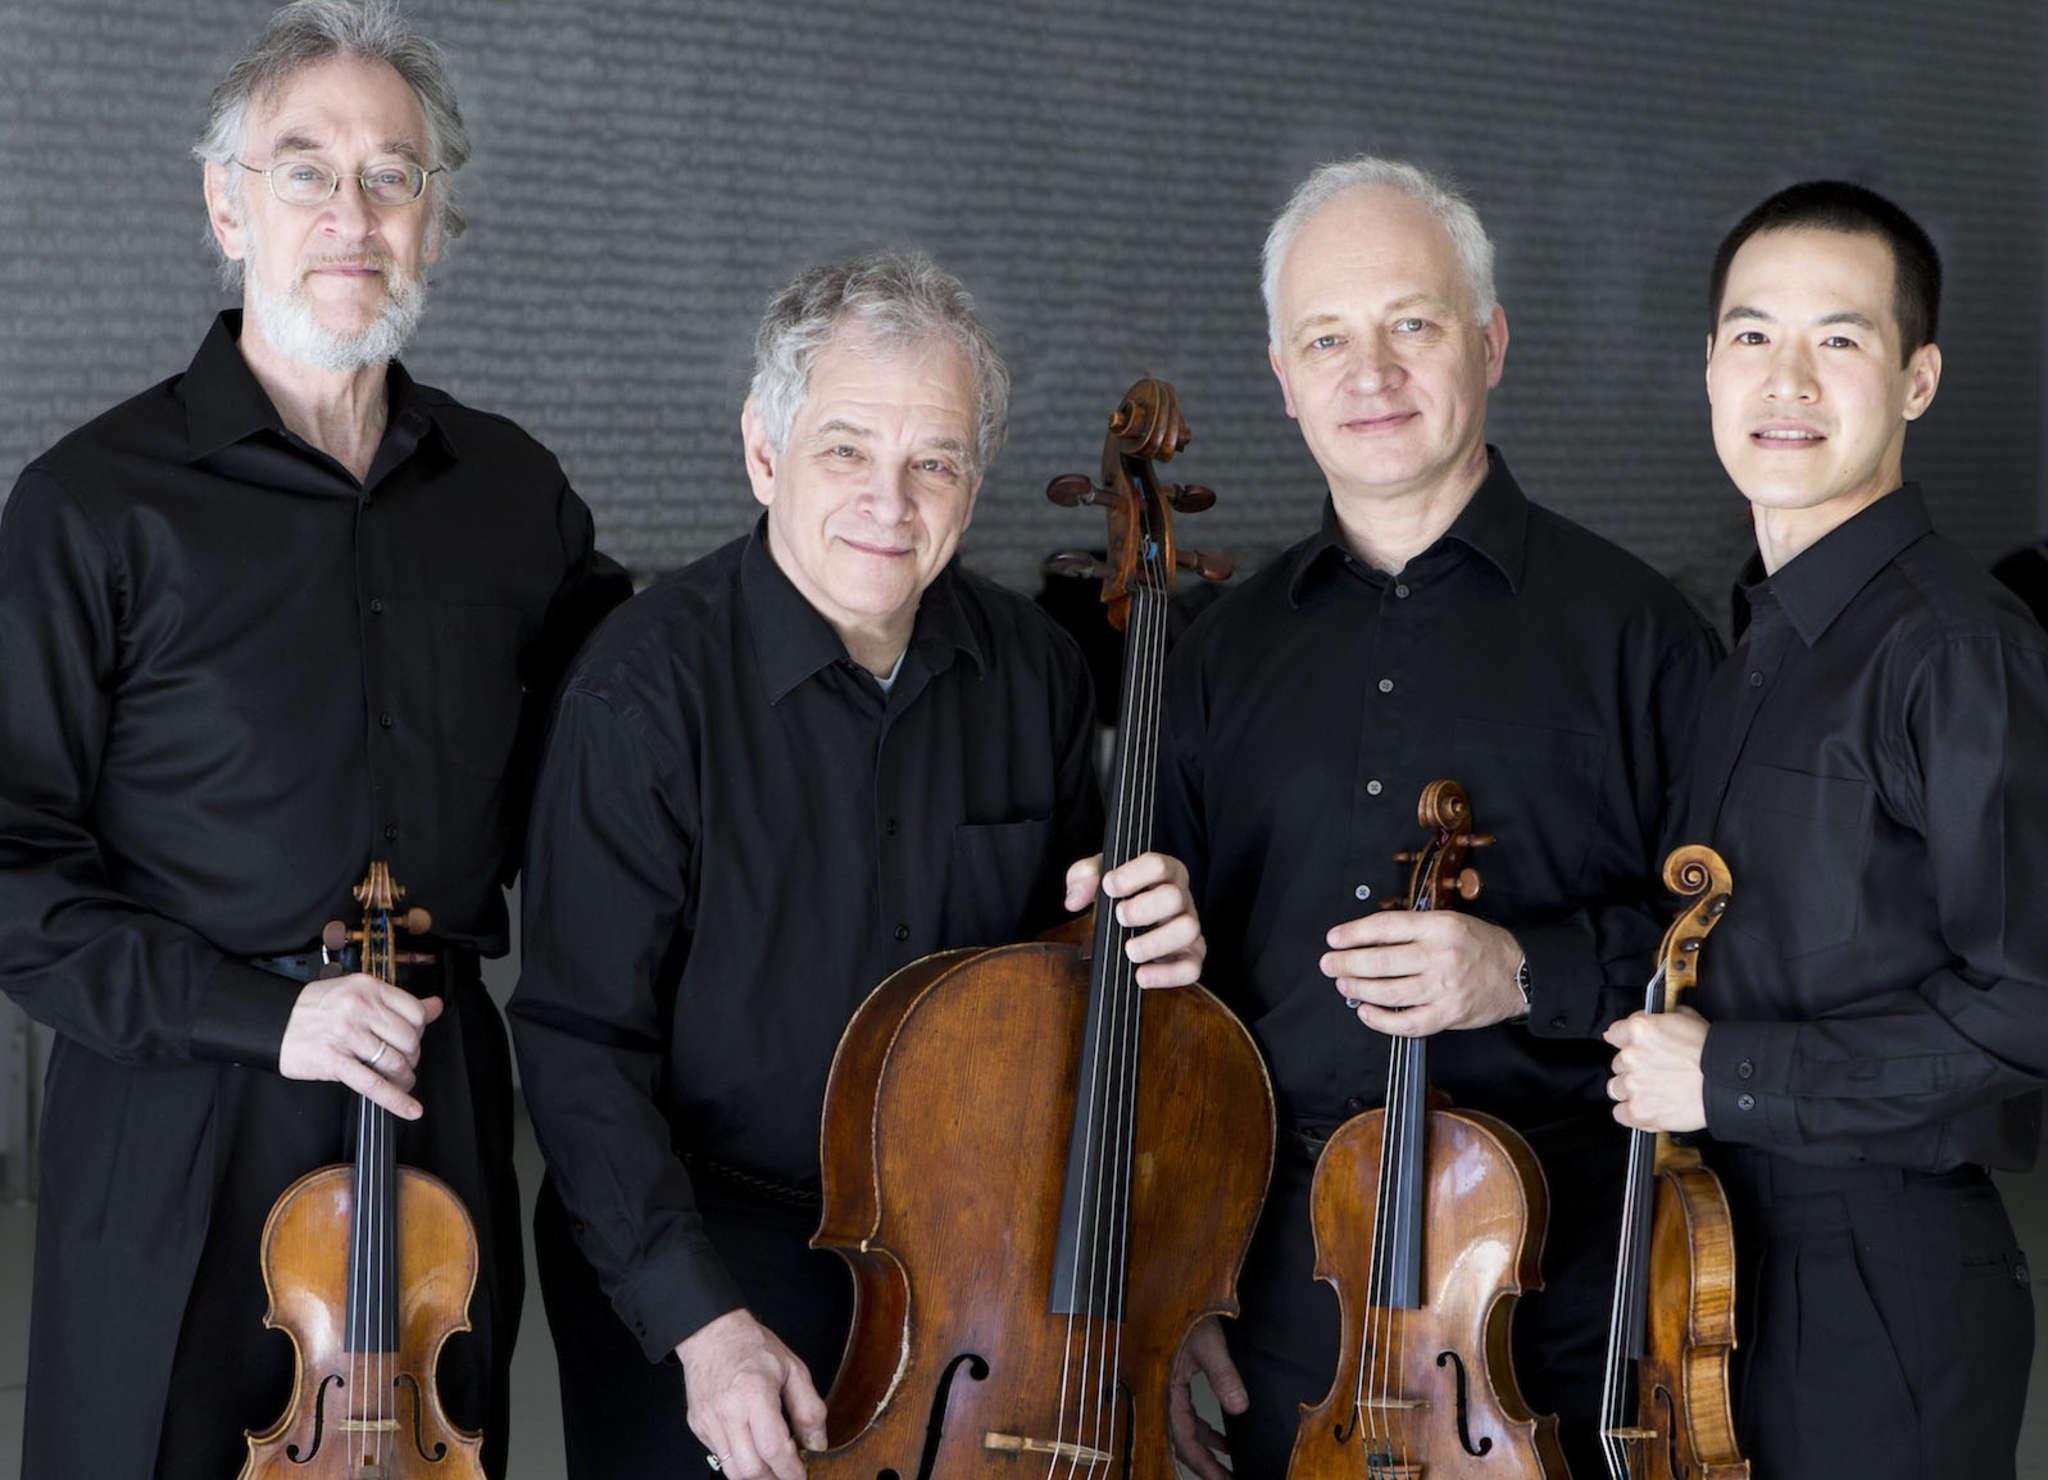 The Juilliard String Quartet : (from left) Ronald Copes, Joel Krosnick, Roger Tapping, and Joseph Lin. SIMON POWIS